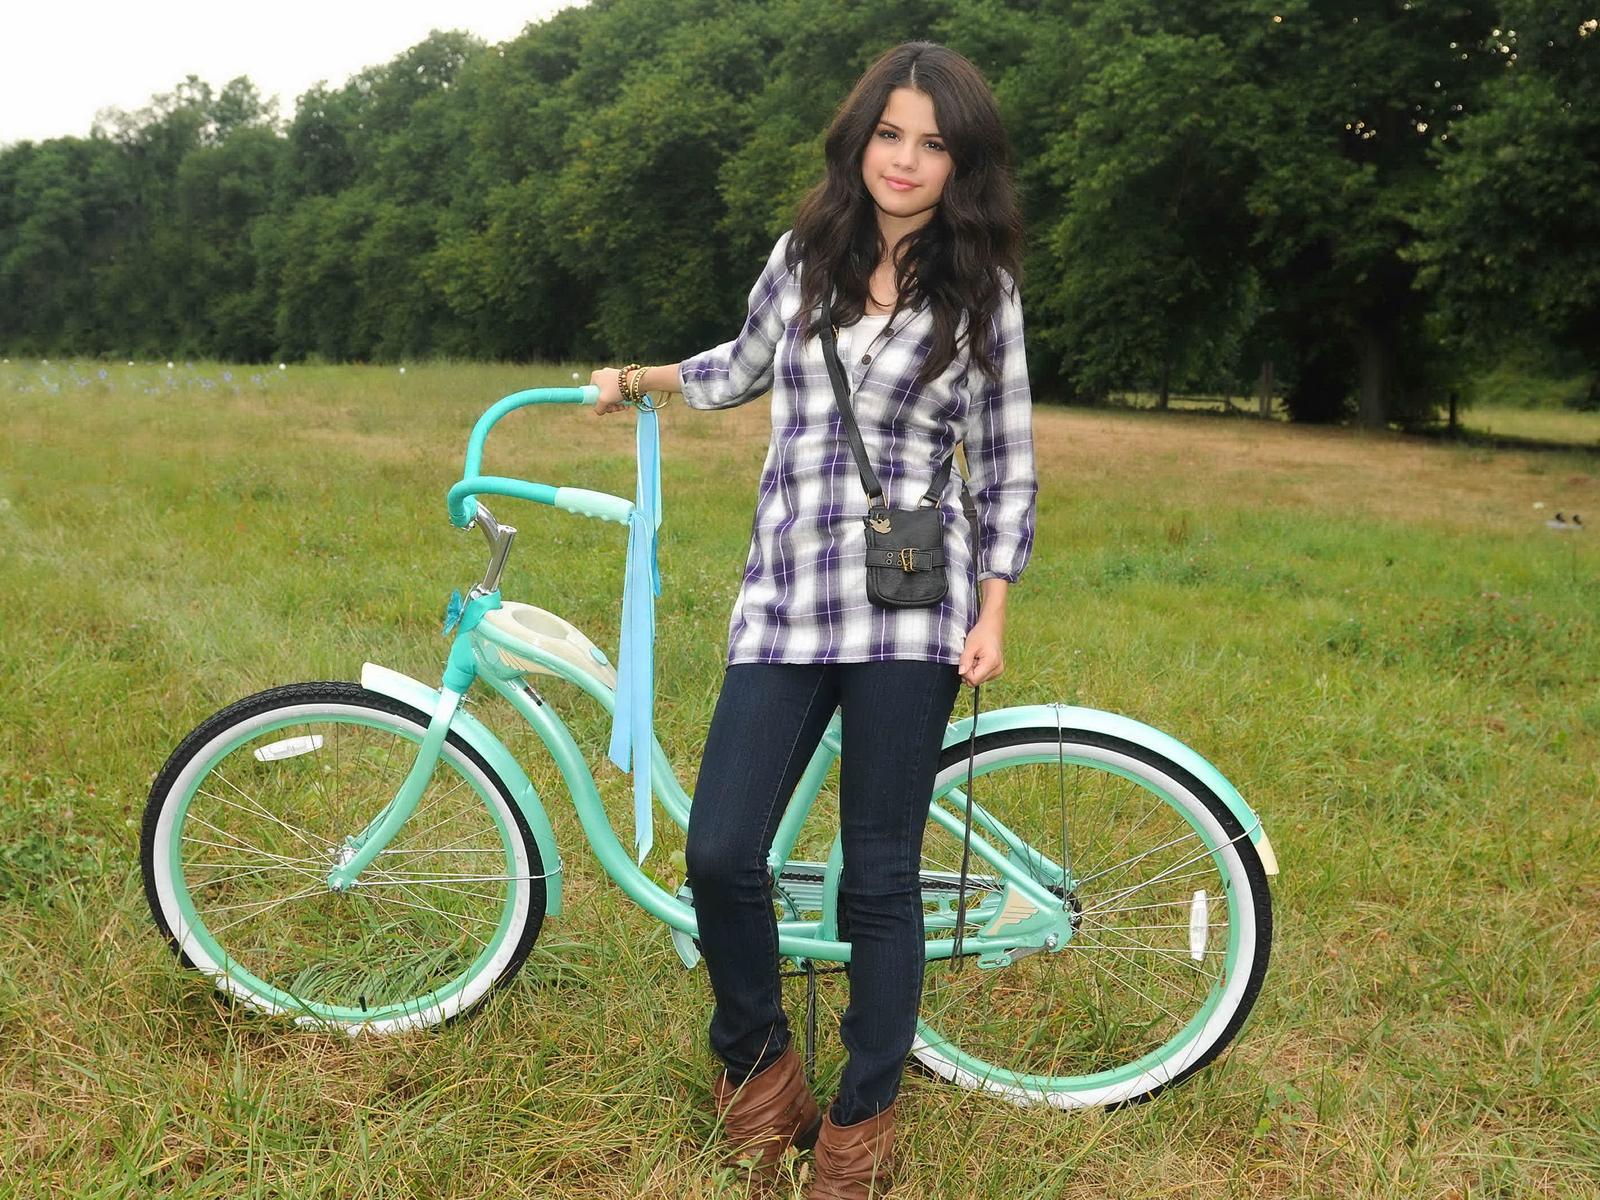 http://3.bp.blogspot.com/-mpAtYt8ReLo/TteylnacpHI/AAAAAAAAAOA/s7e09WXh2kY/s1600/Selena+Gomez+07.jpg